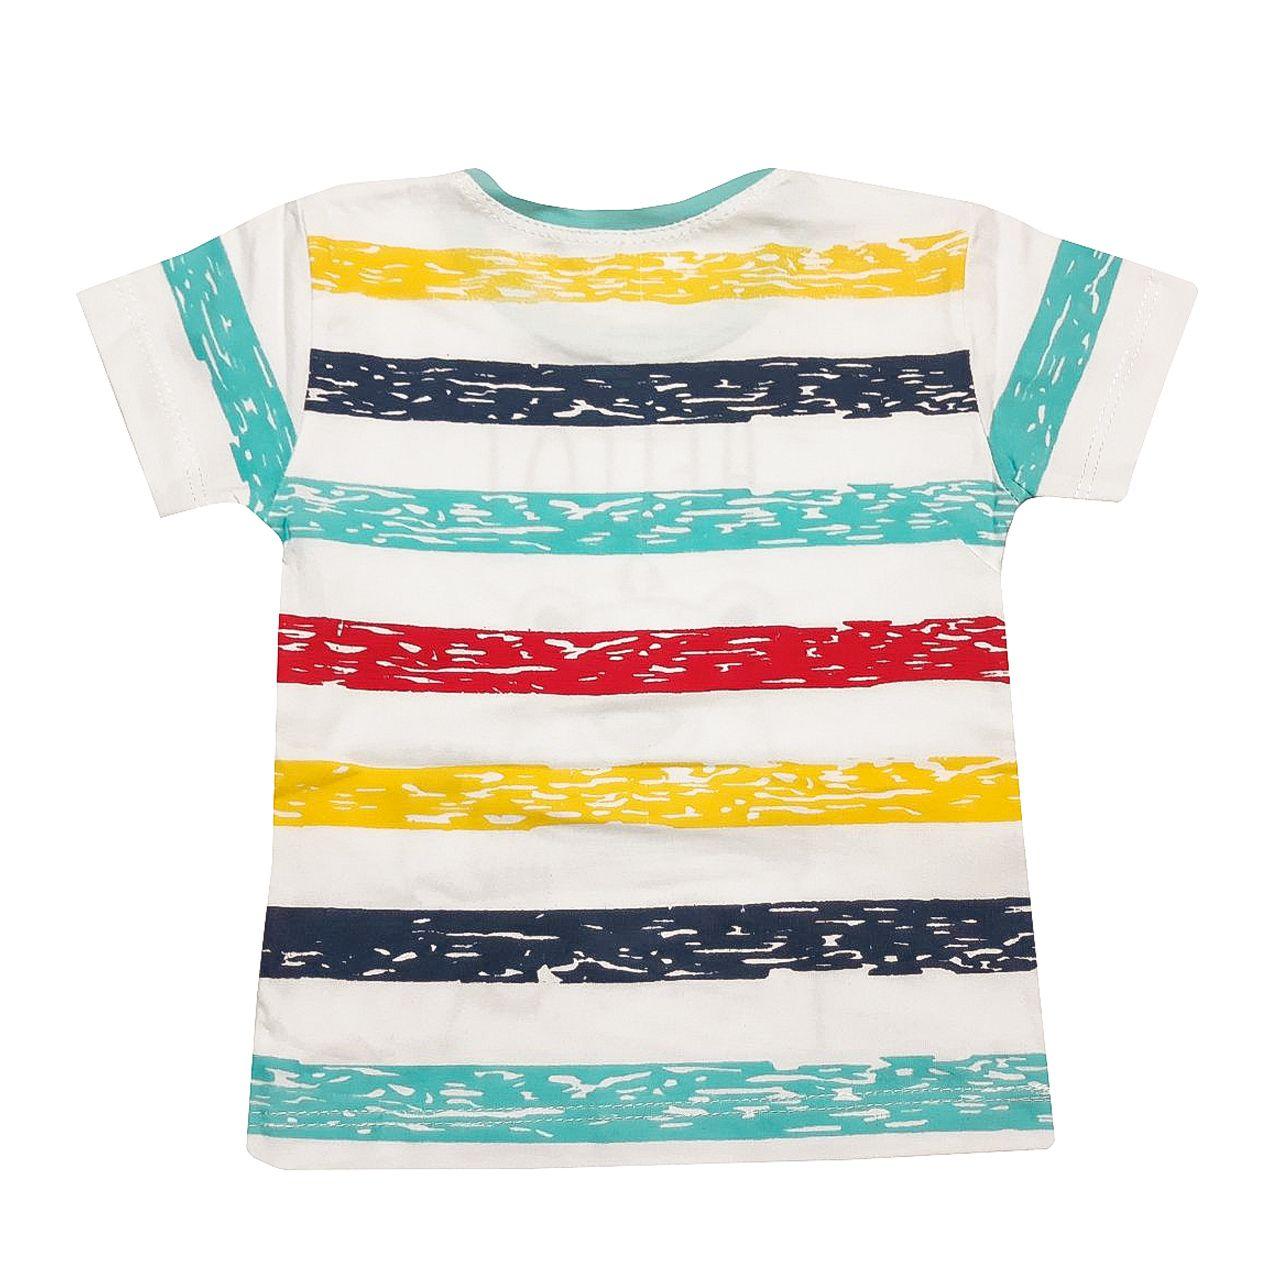 ست تی شرت و شلوارک پسرانه کد A -  - 3